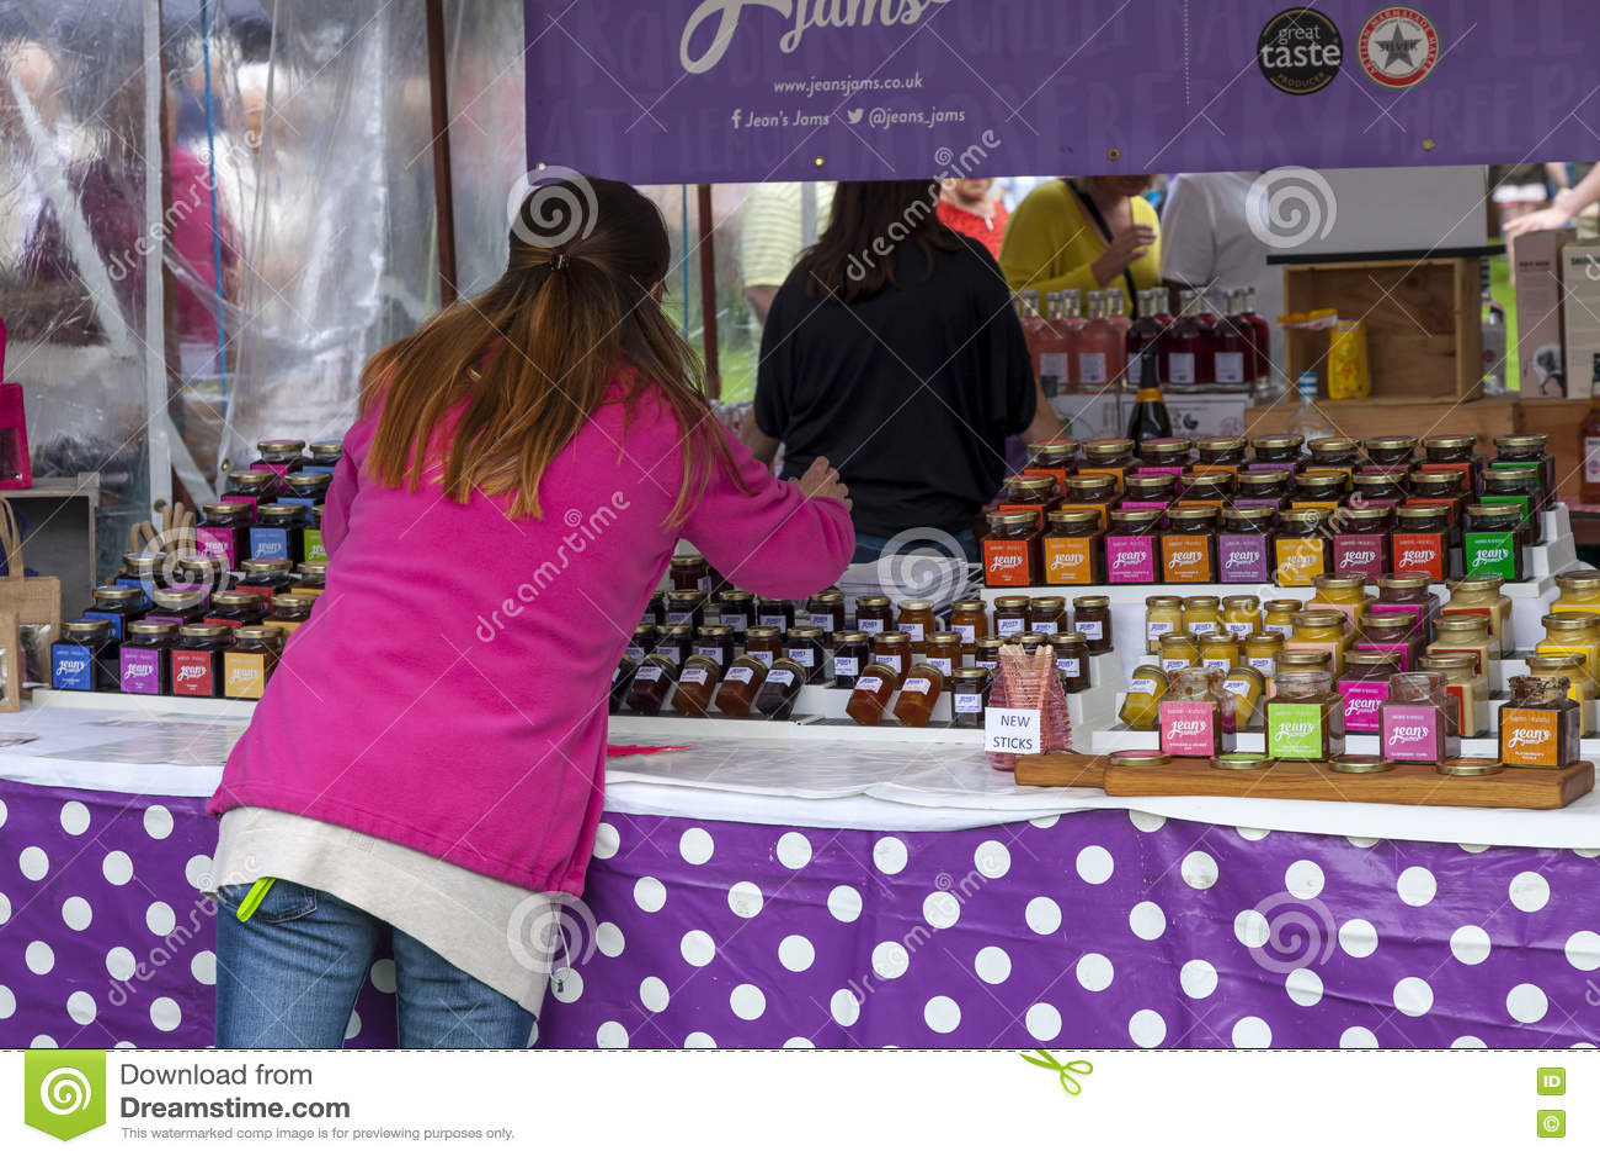 Food Stall at Cramlington, Northumberland.